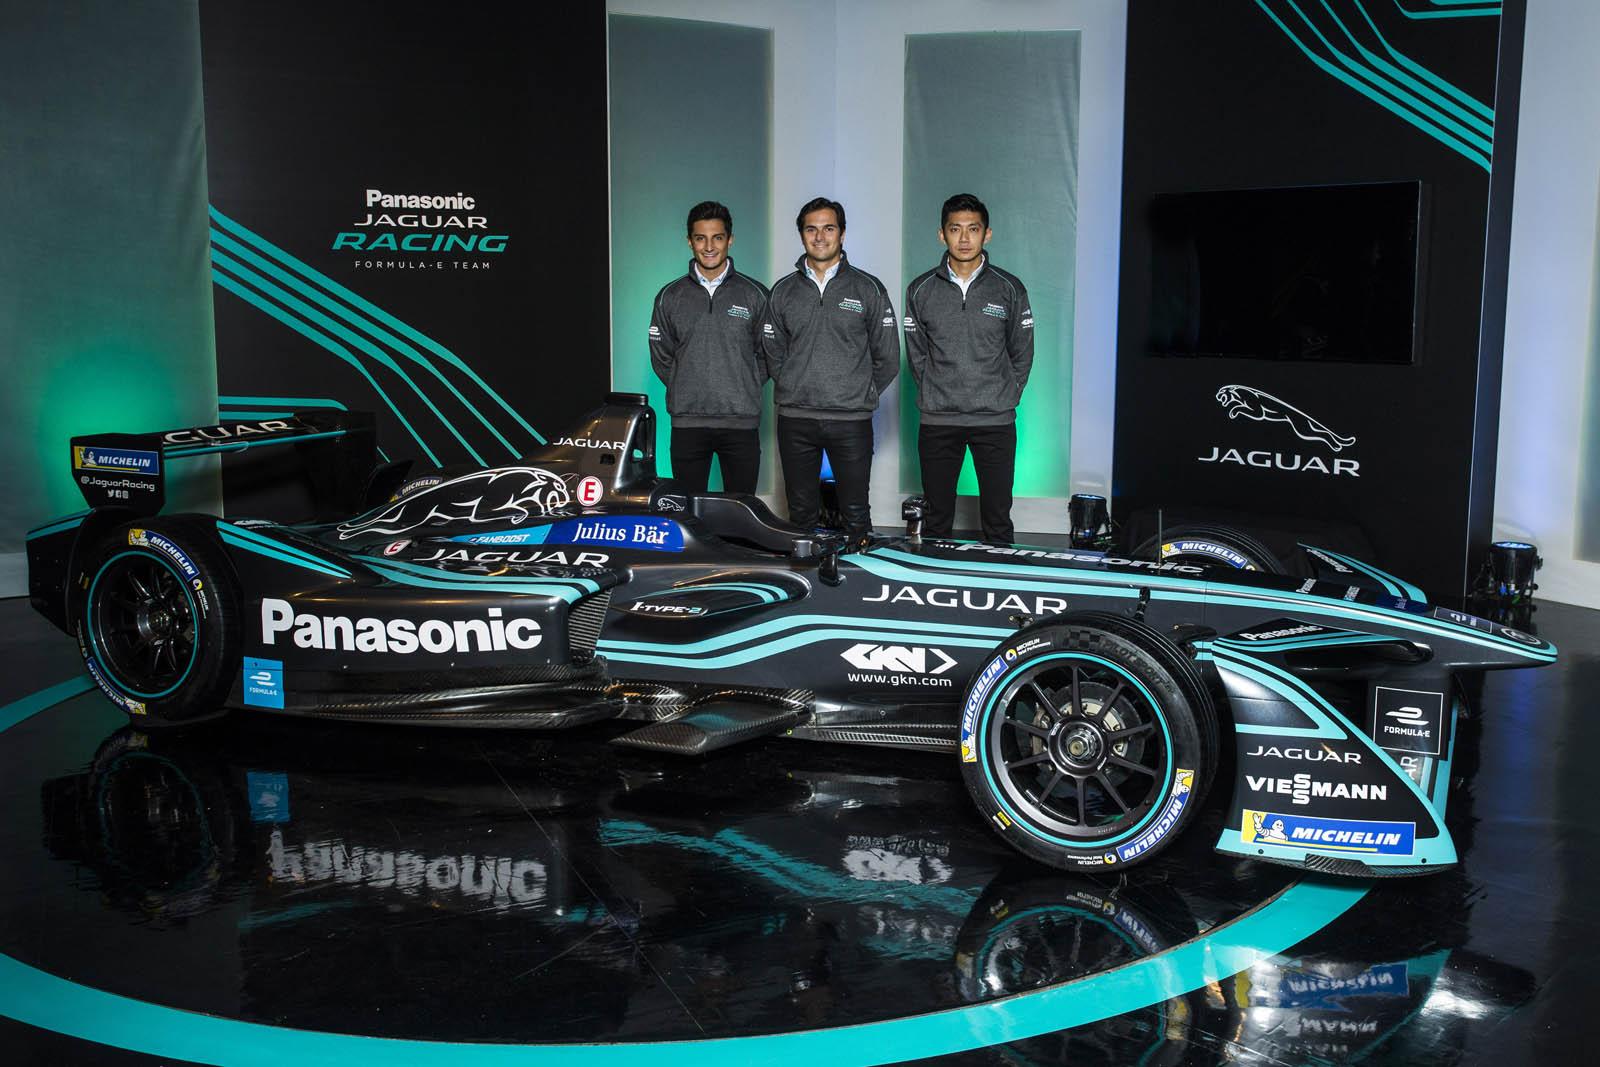 Wallpaper Night Car Race Jaguar Jaguar Racing Picks Up Nelson Piquet For Formula E